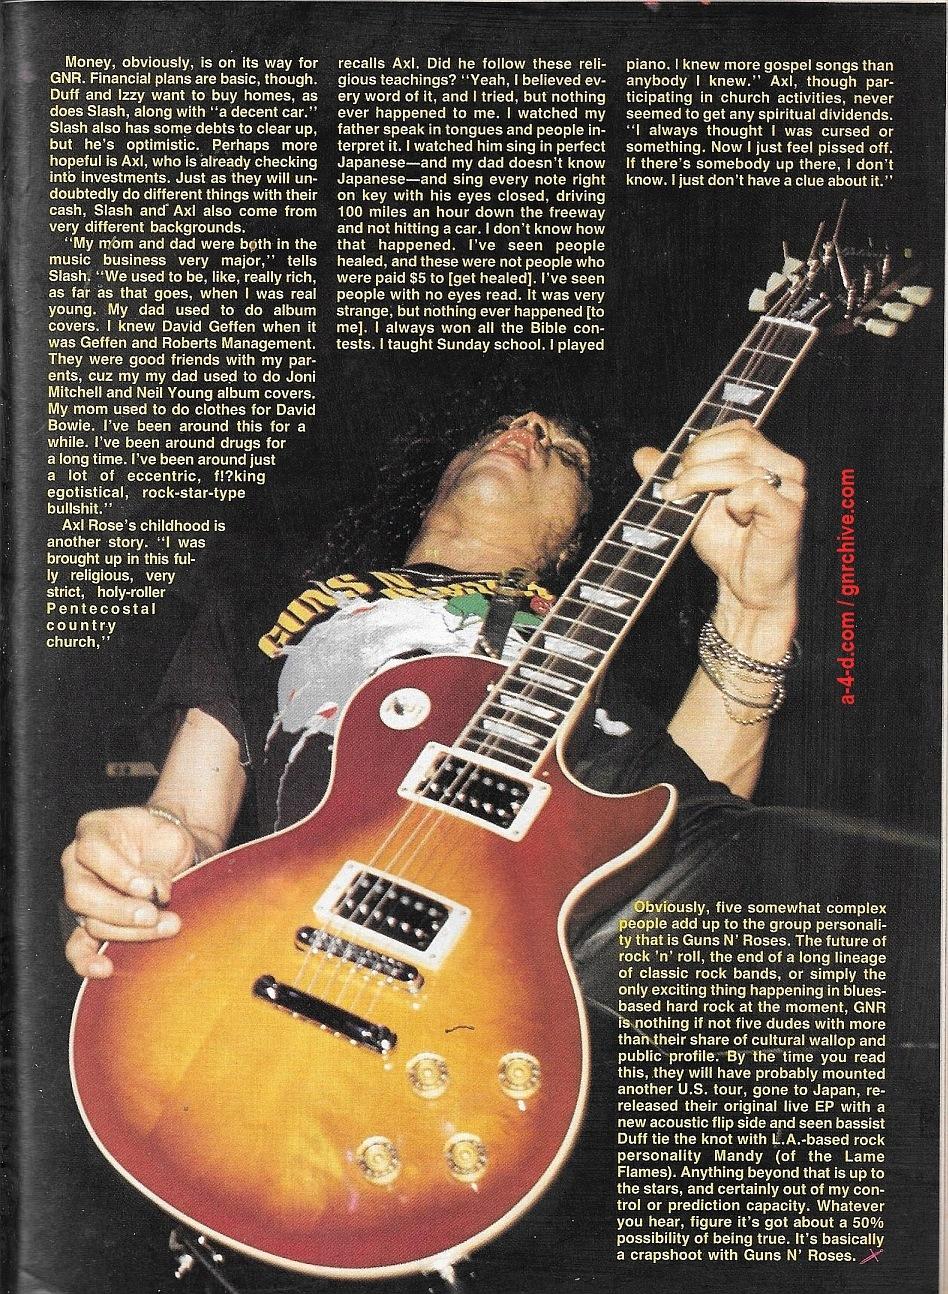 1988.06.DD - RIP Magazine - Guns N' Roses On The Stairway To Rock Heaven (Axl, Slash, Izzy, Duff) 1988_107